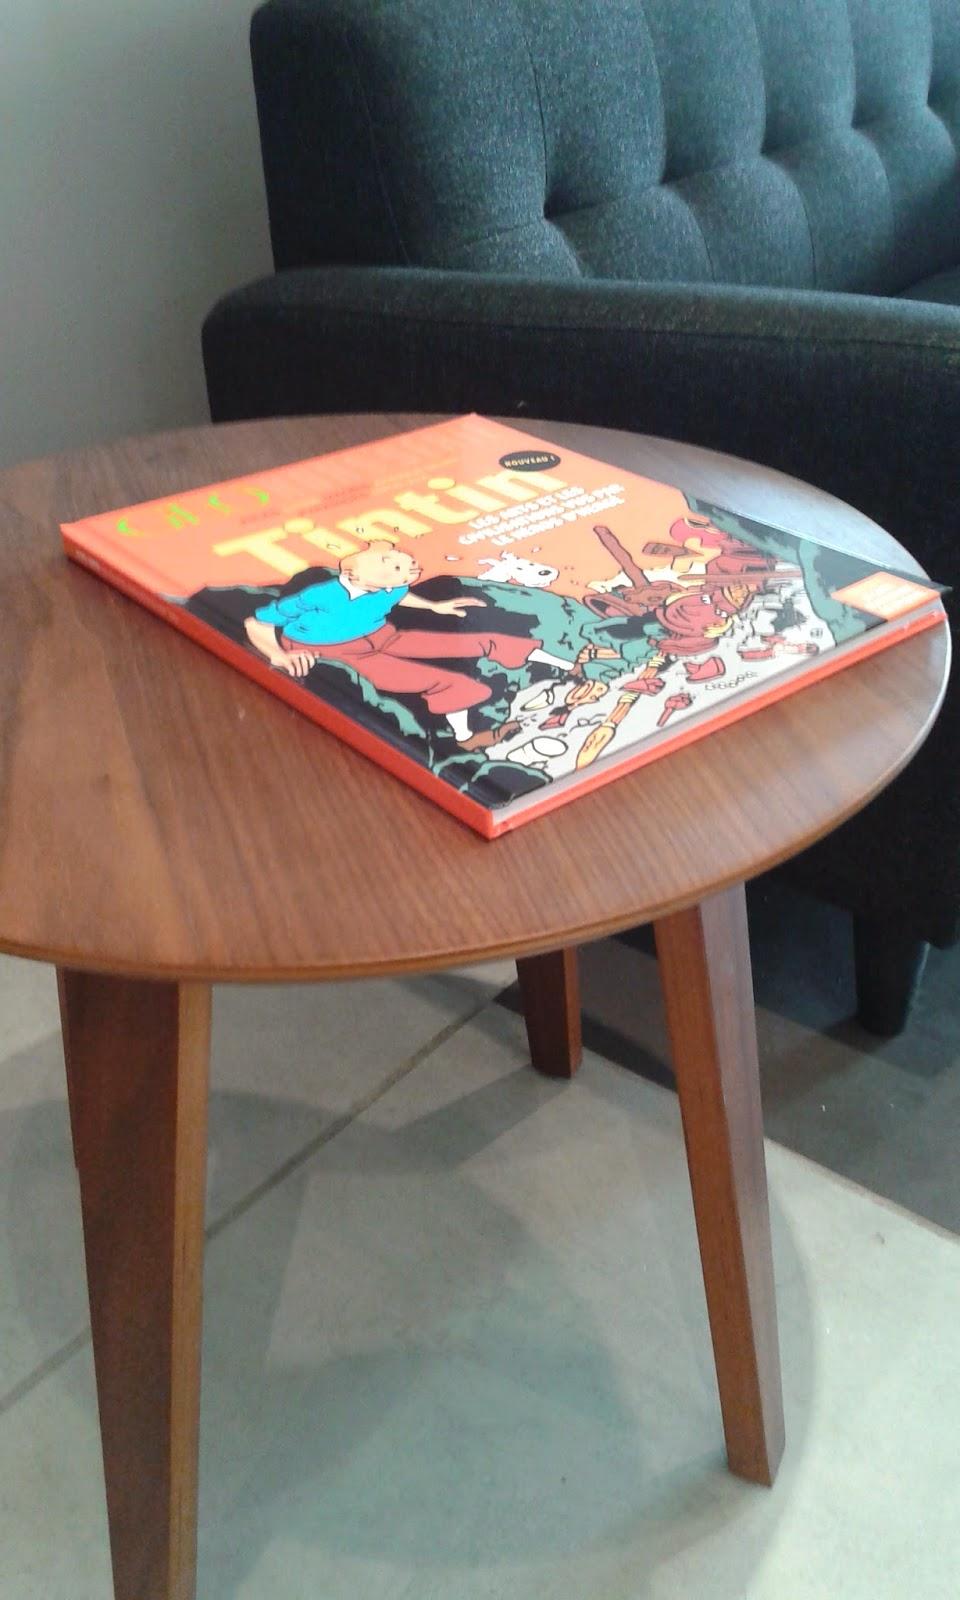 le bois d 39 h v a en ameublement. Black Bedroom Furniture Sets. Home Design Ideas